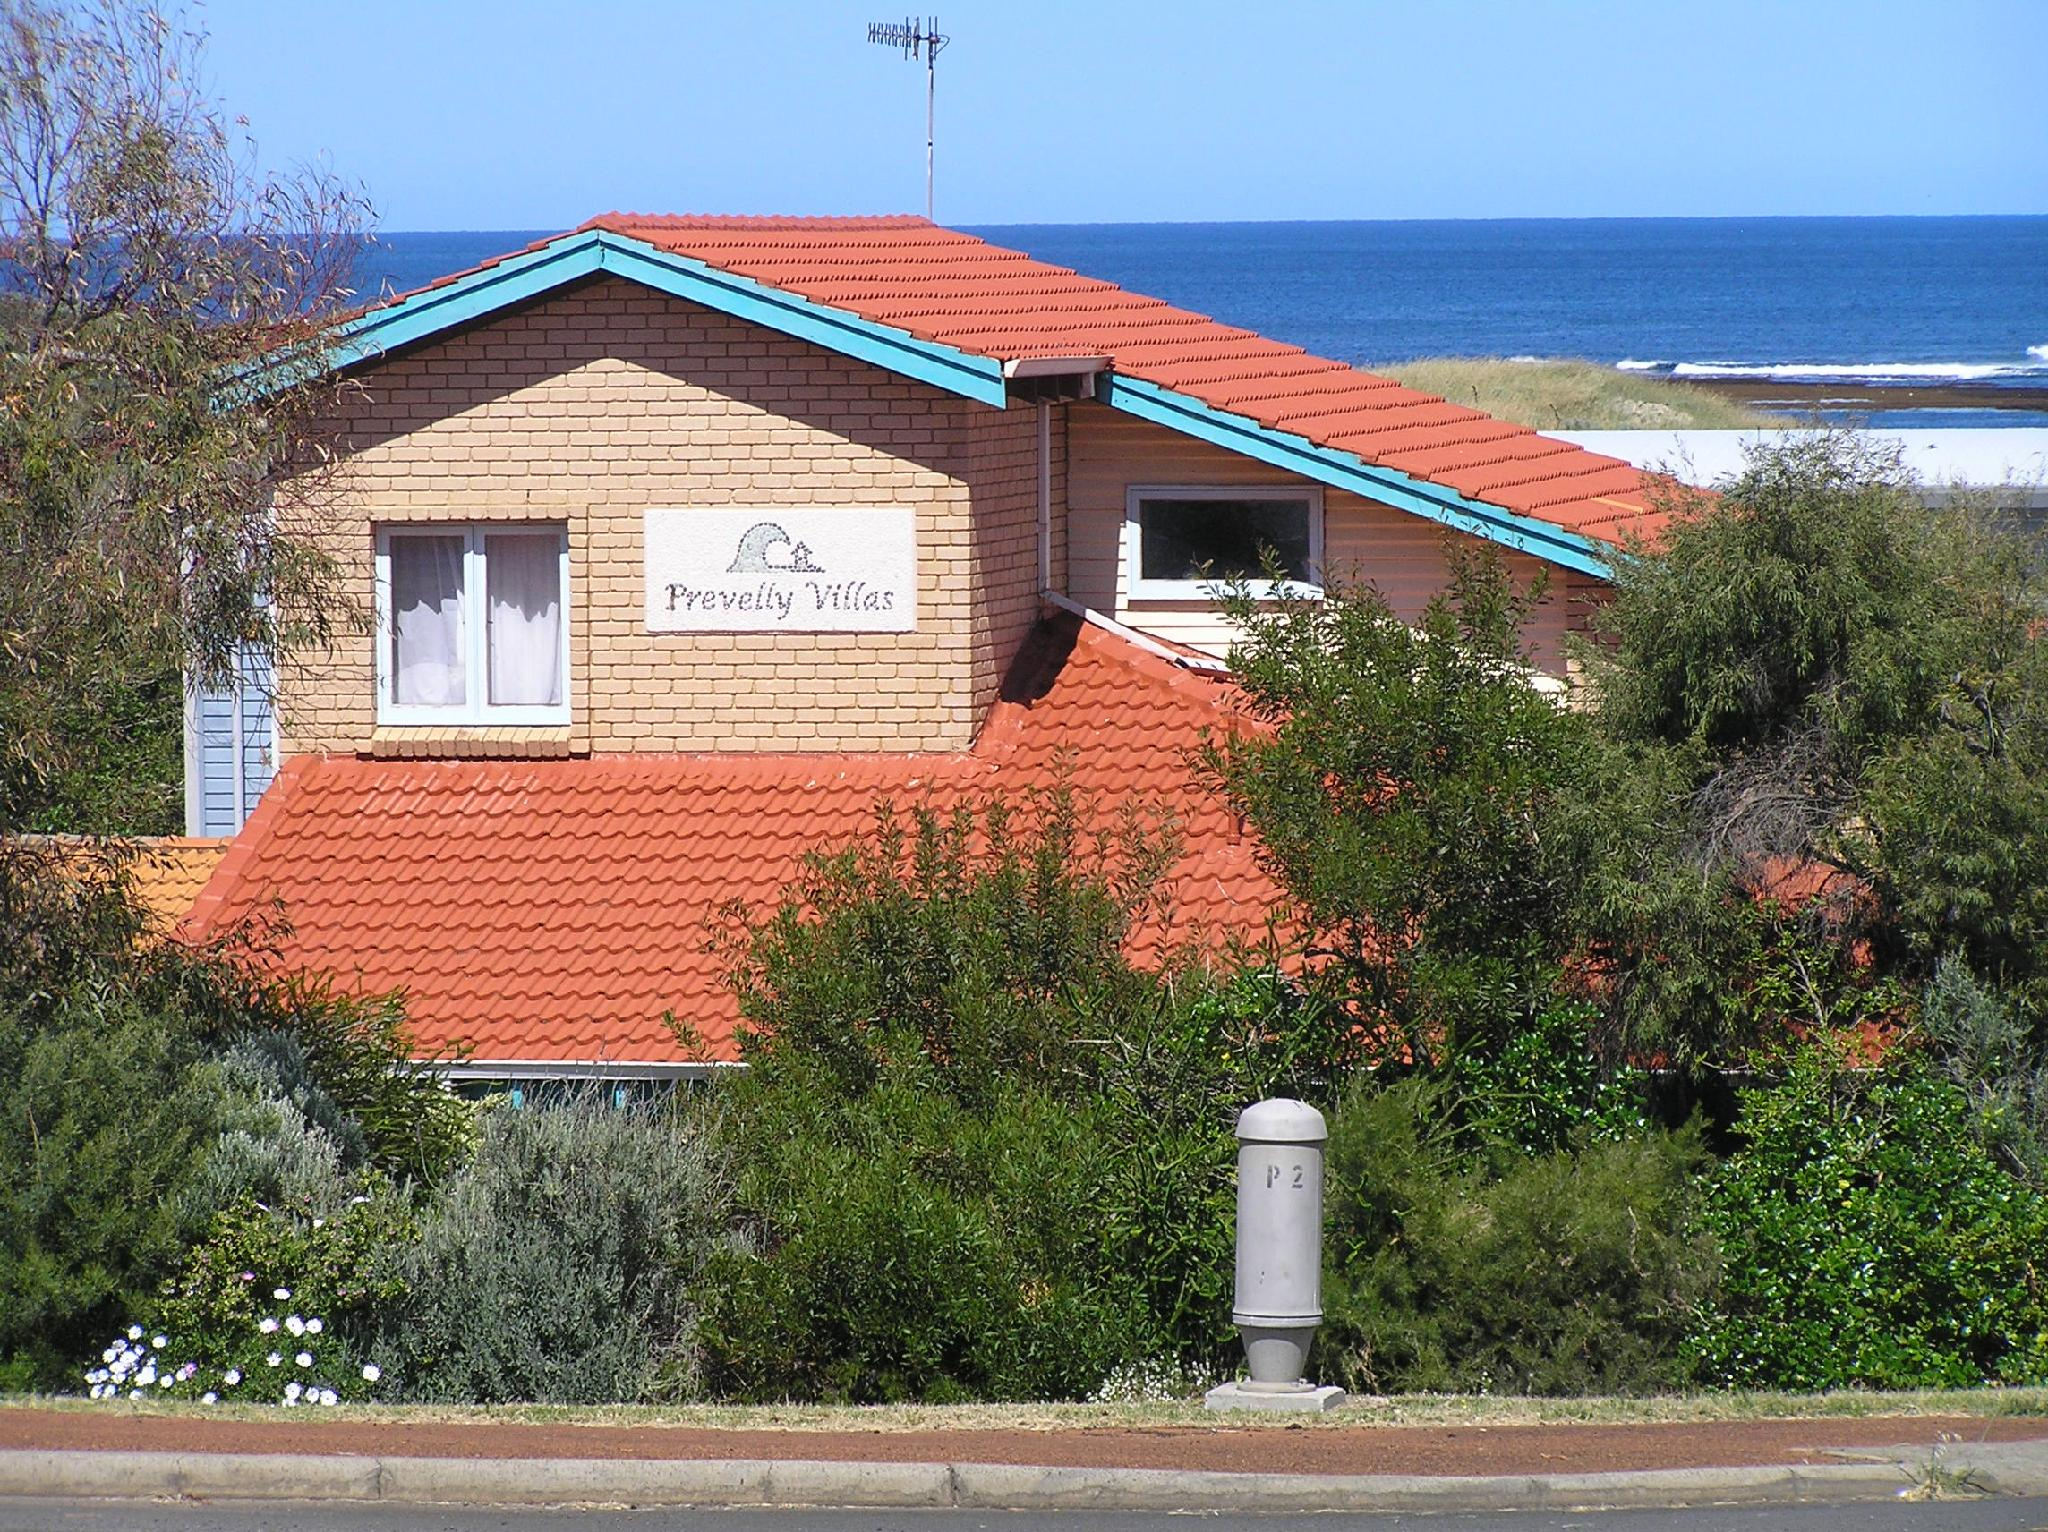 Beachside Prevelly Villas - Hotell och Boende i Australien , Margaret River Wine Region